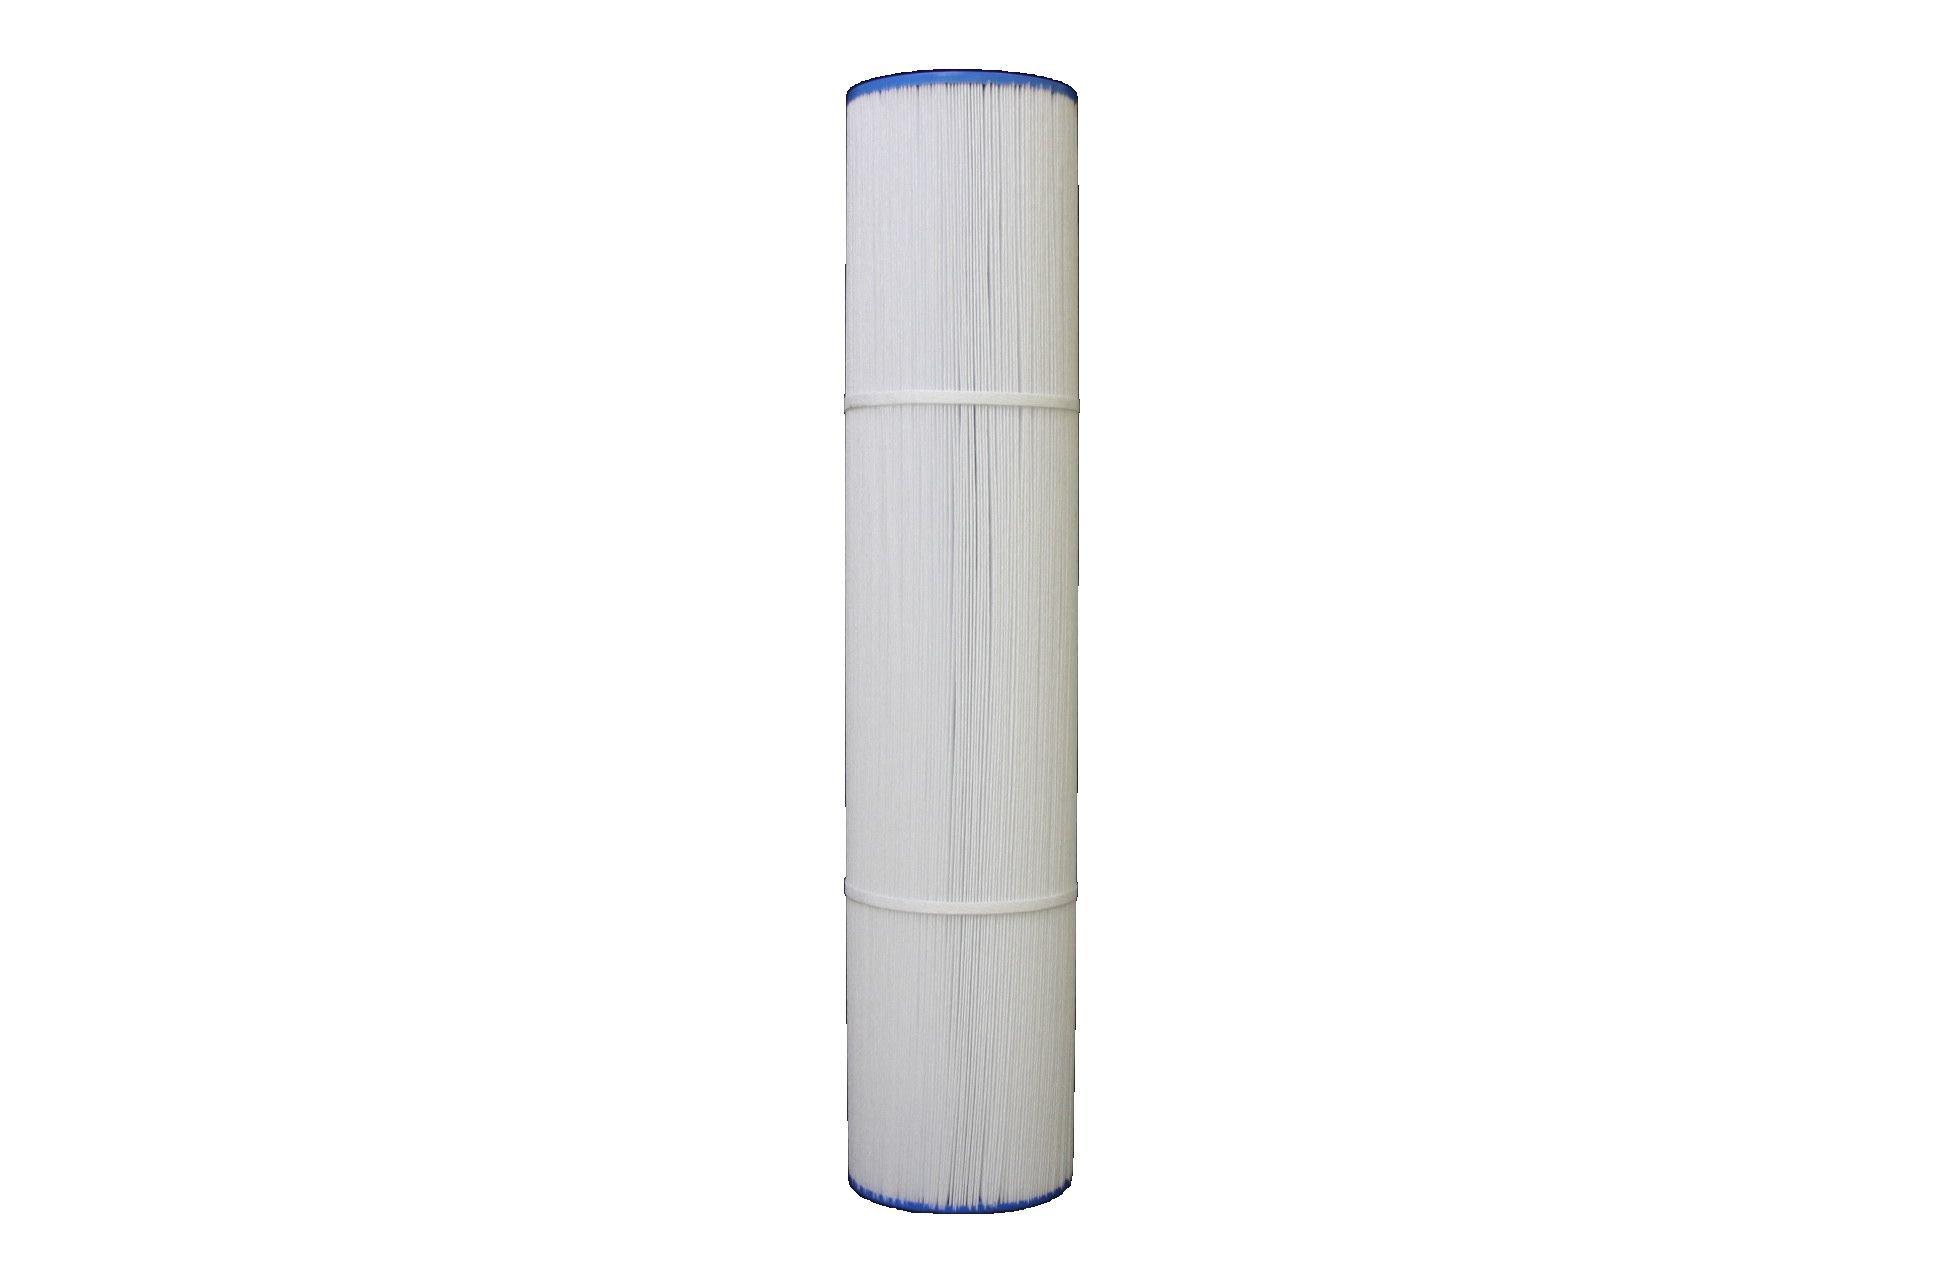 GAURDIAN POOL/SPA Filter Fits:Unicel C-5396, Pleatco PCST80, Filbur PLBS75, COAST SPAS